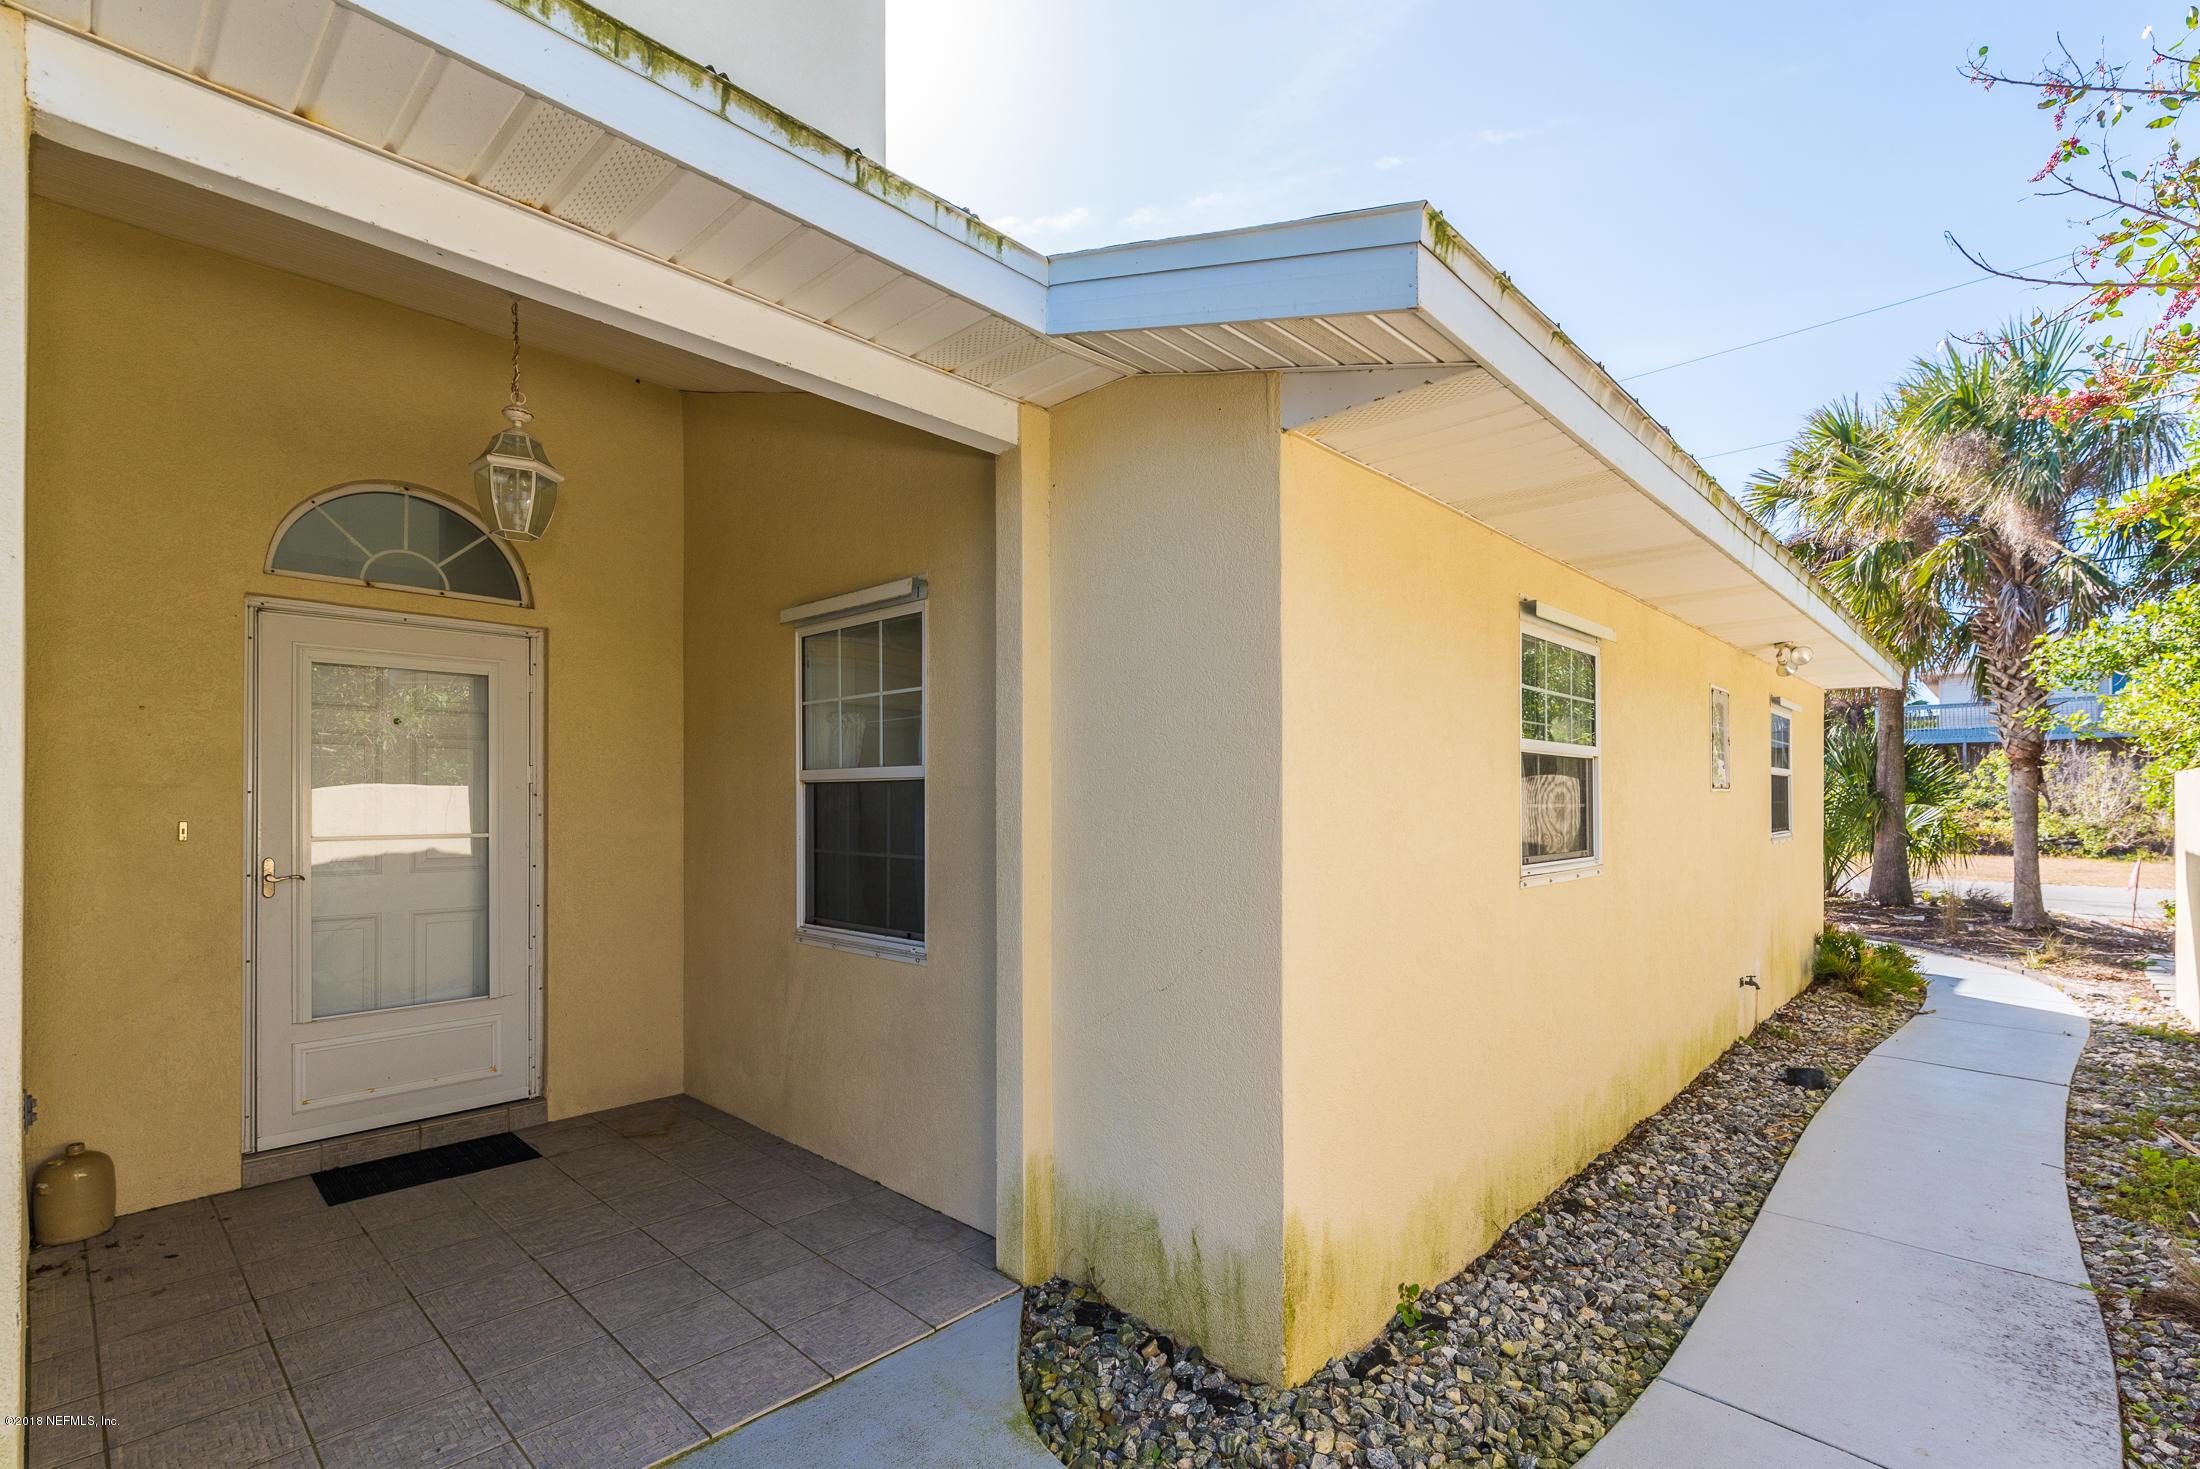 5172 ATLANTIC VIEW, ST AUGUSTINE, FLORIDA 32080, 4 Bedrooms Bedrooms, ,3 BathroomsBathrooms,Residential - single family,For sale,ATLANTIC VIEW,918559